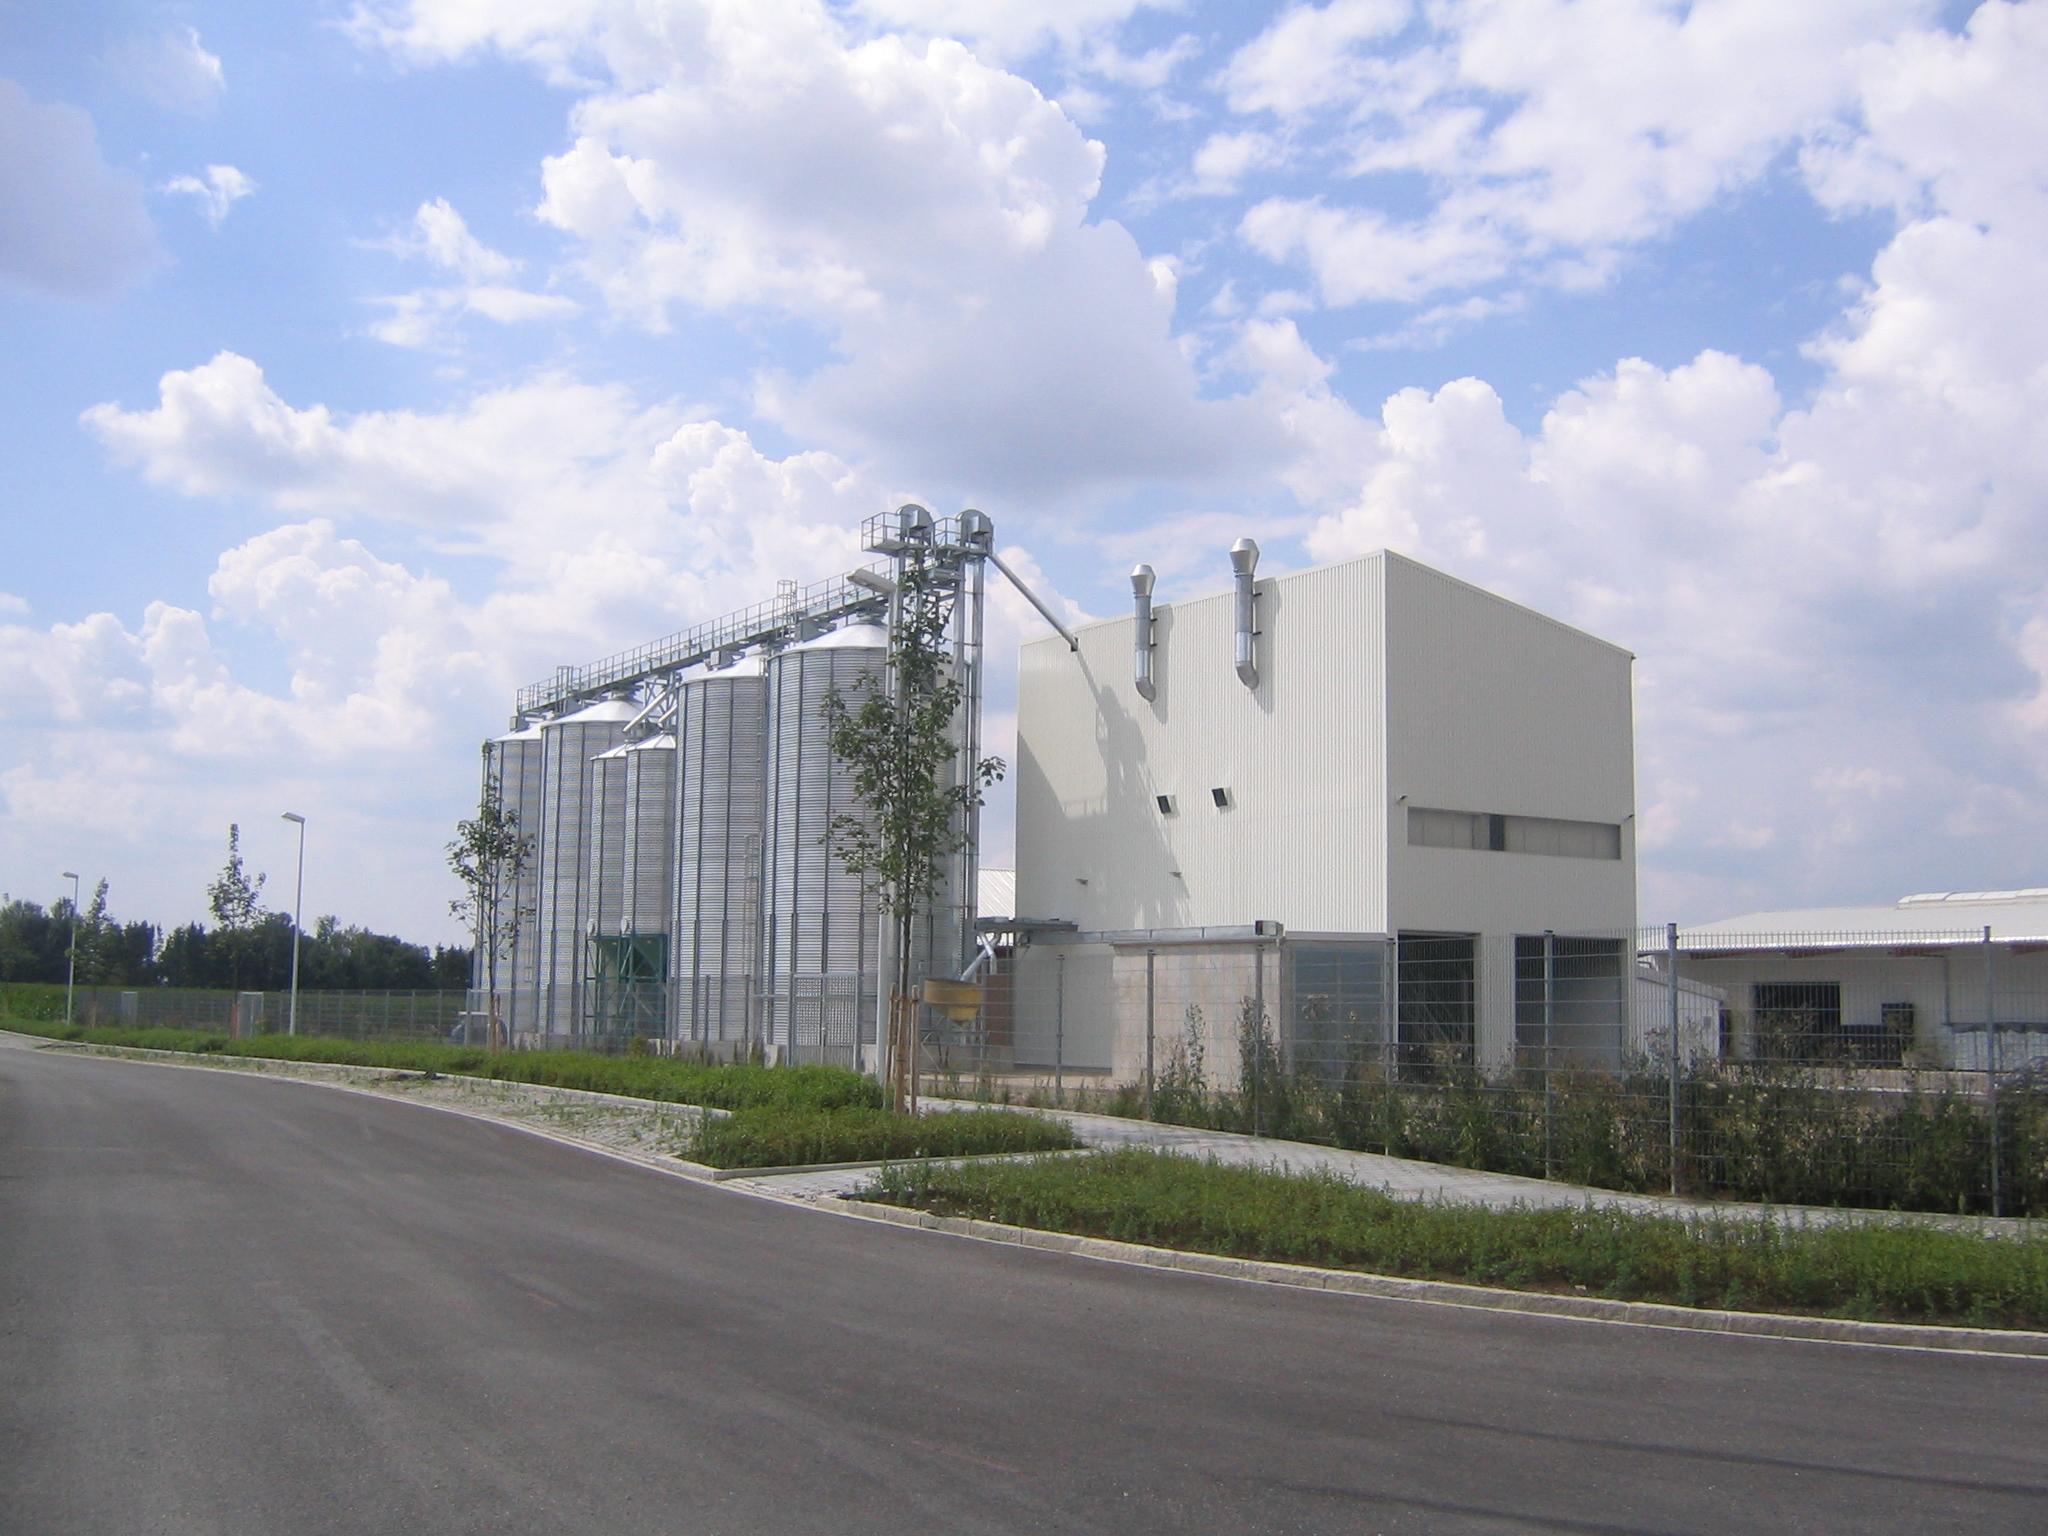 Silo Plant Construction